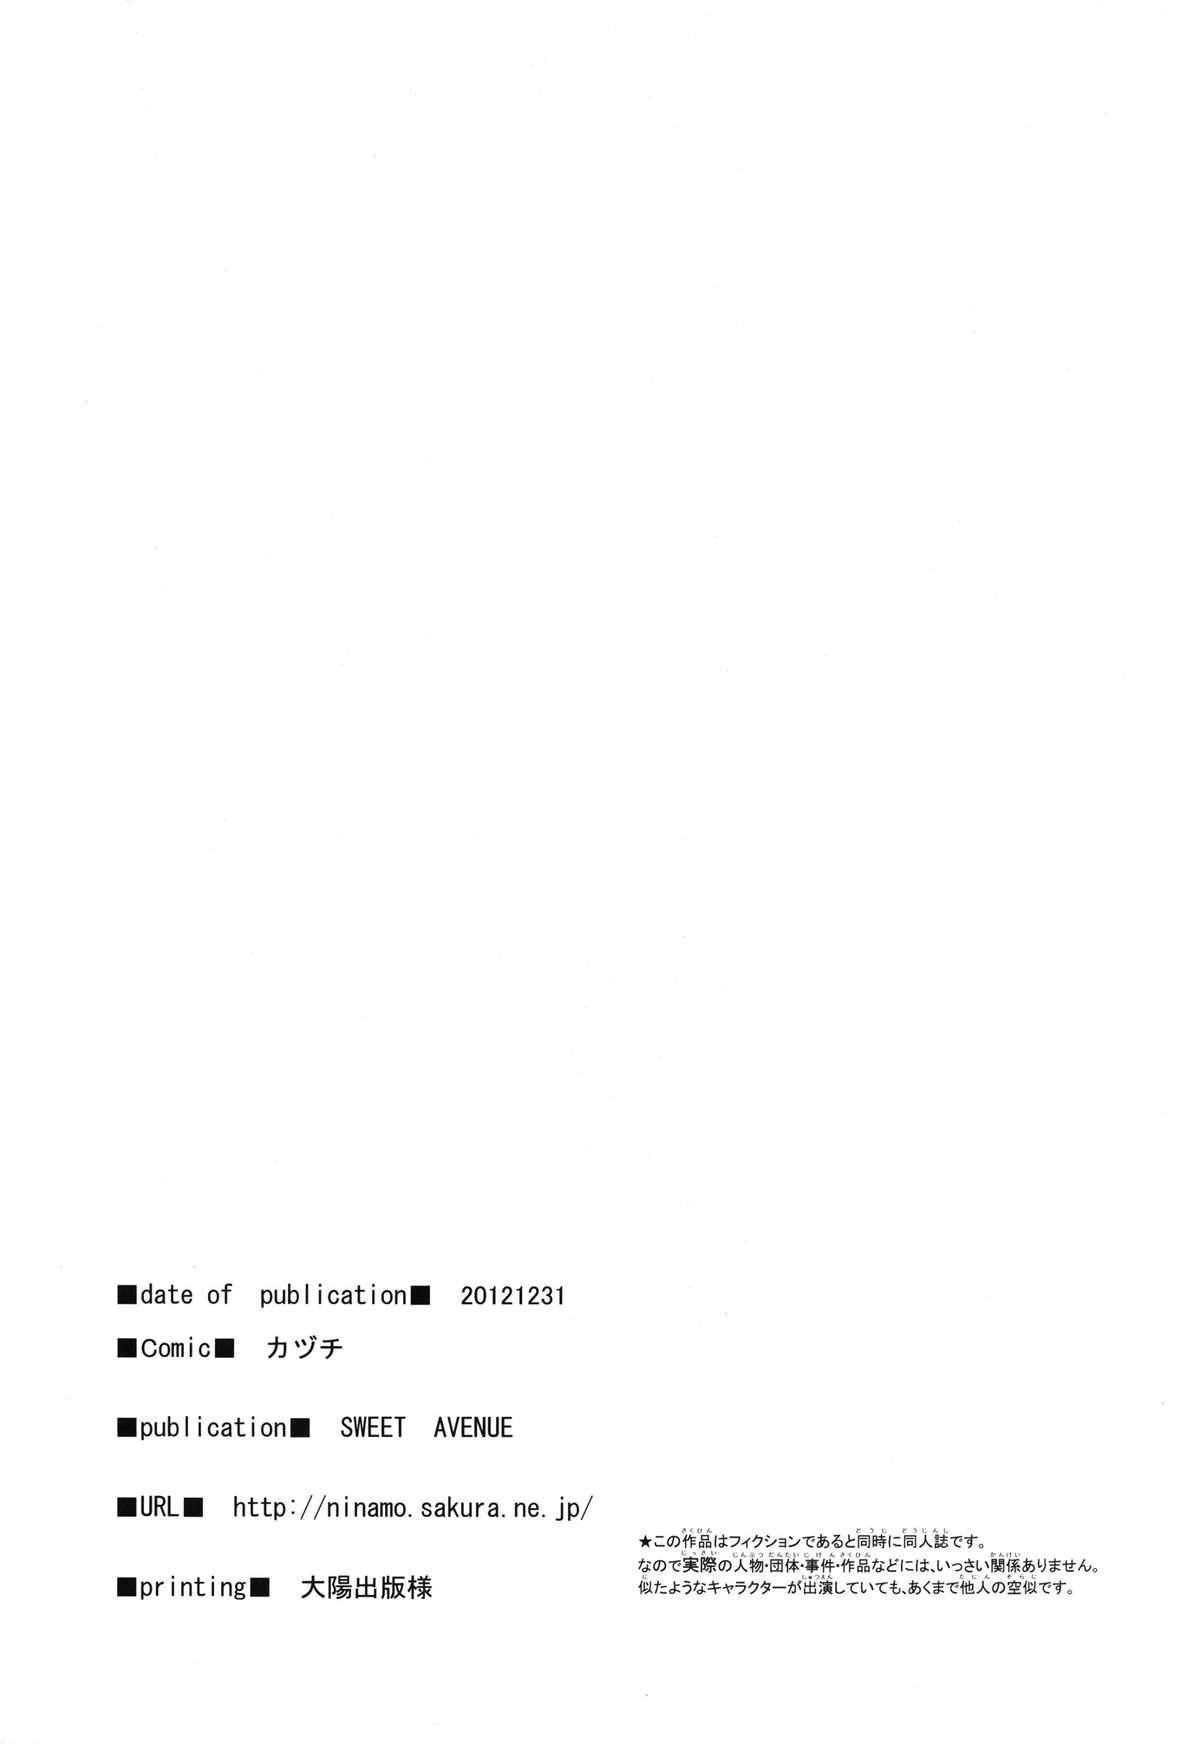 [Sweet Avenue (Kaduchi)] Catch-A-Ride!! (THE iDOLM@STER CINDERELLA GIRLS) [English] [doujin-moe.us] [Digital] 16